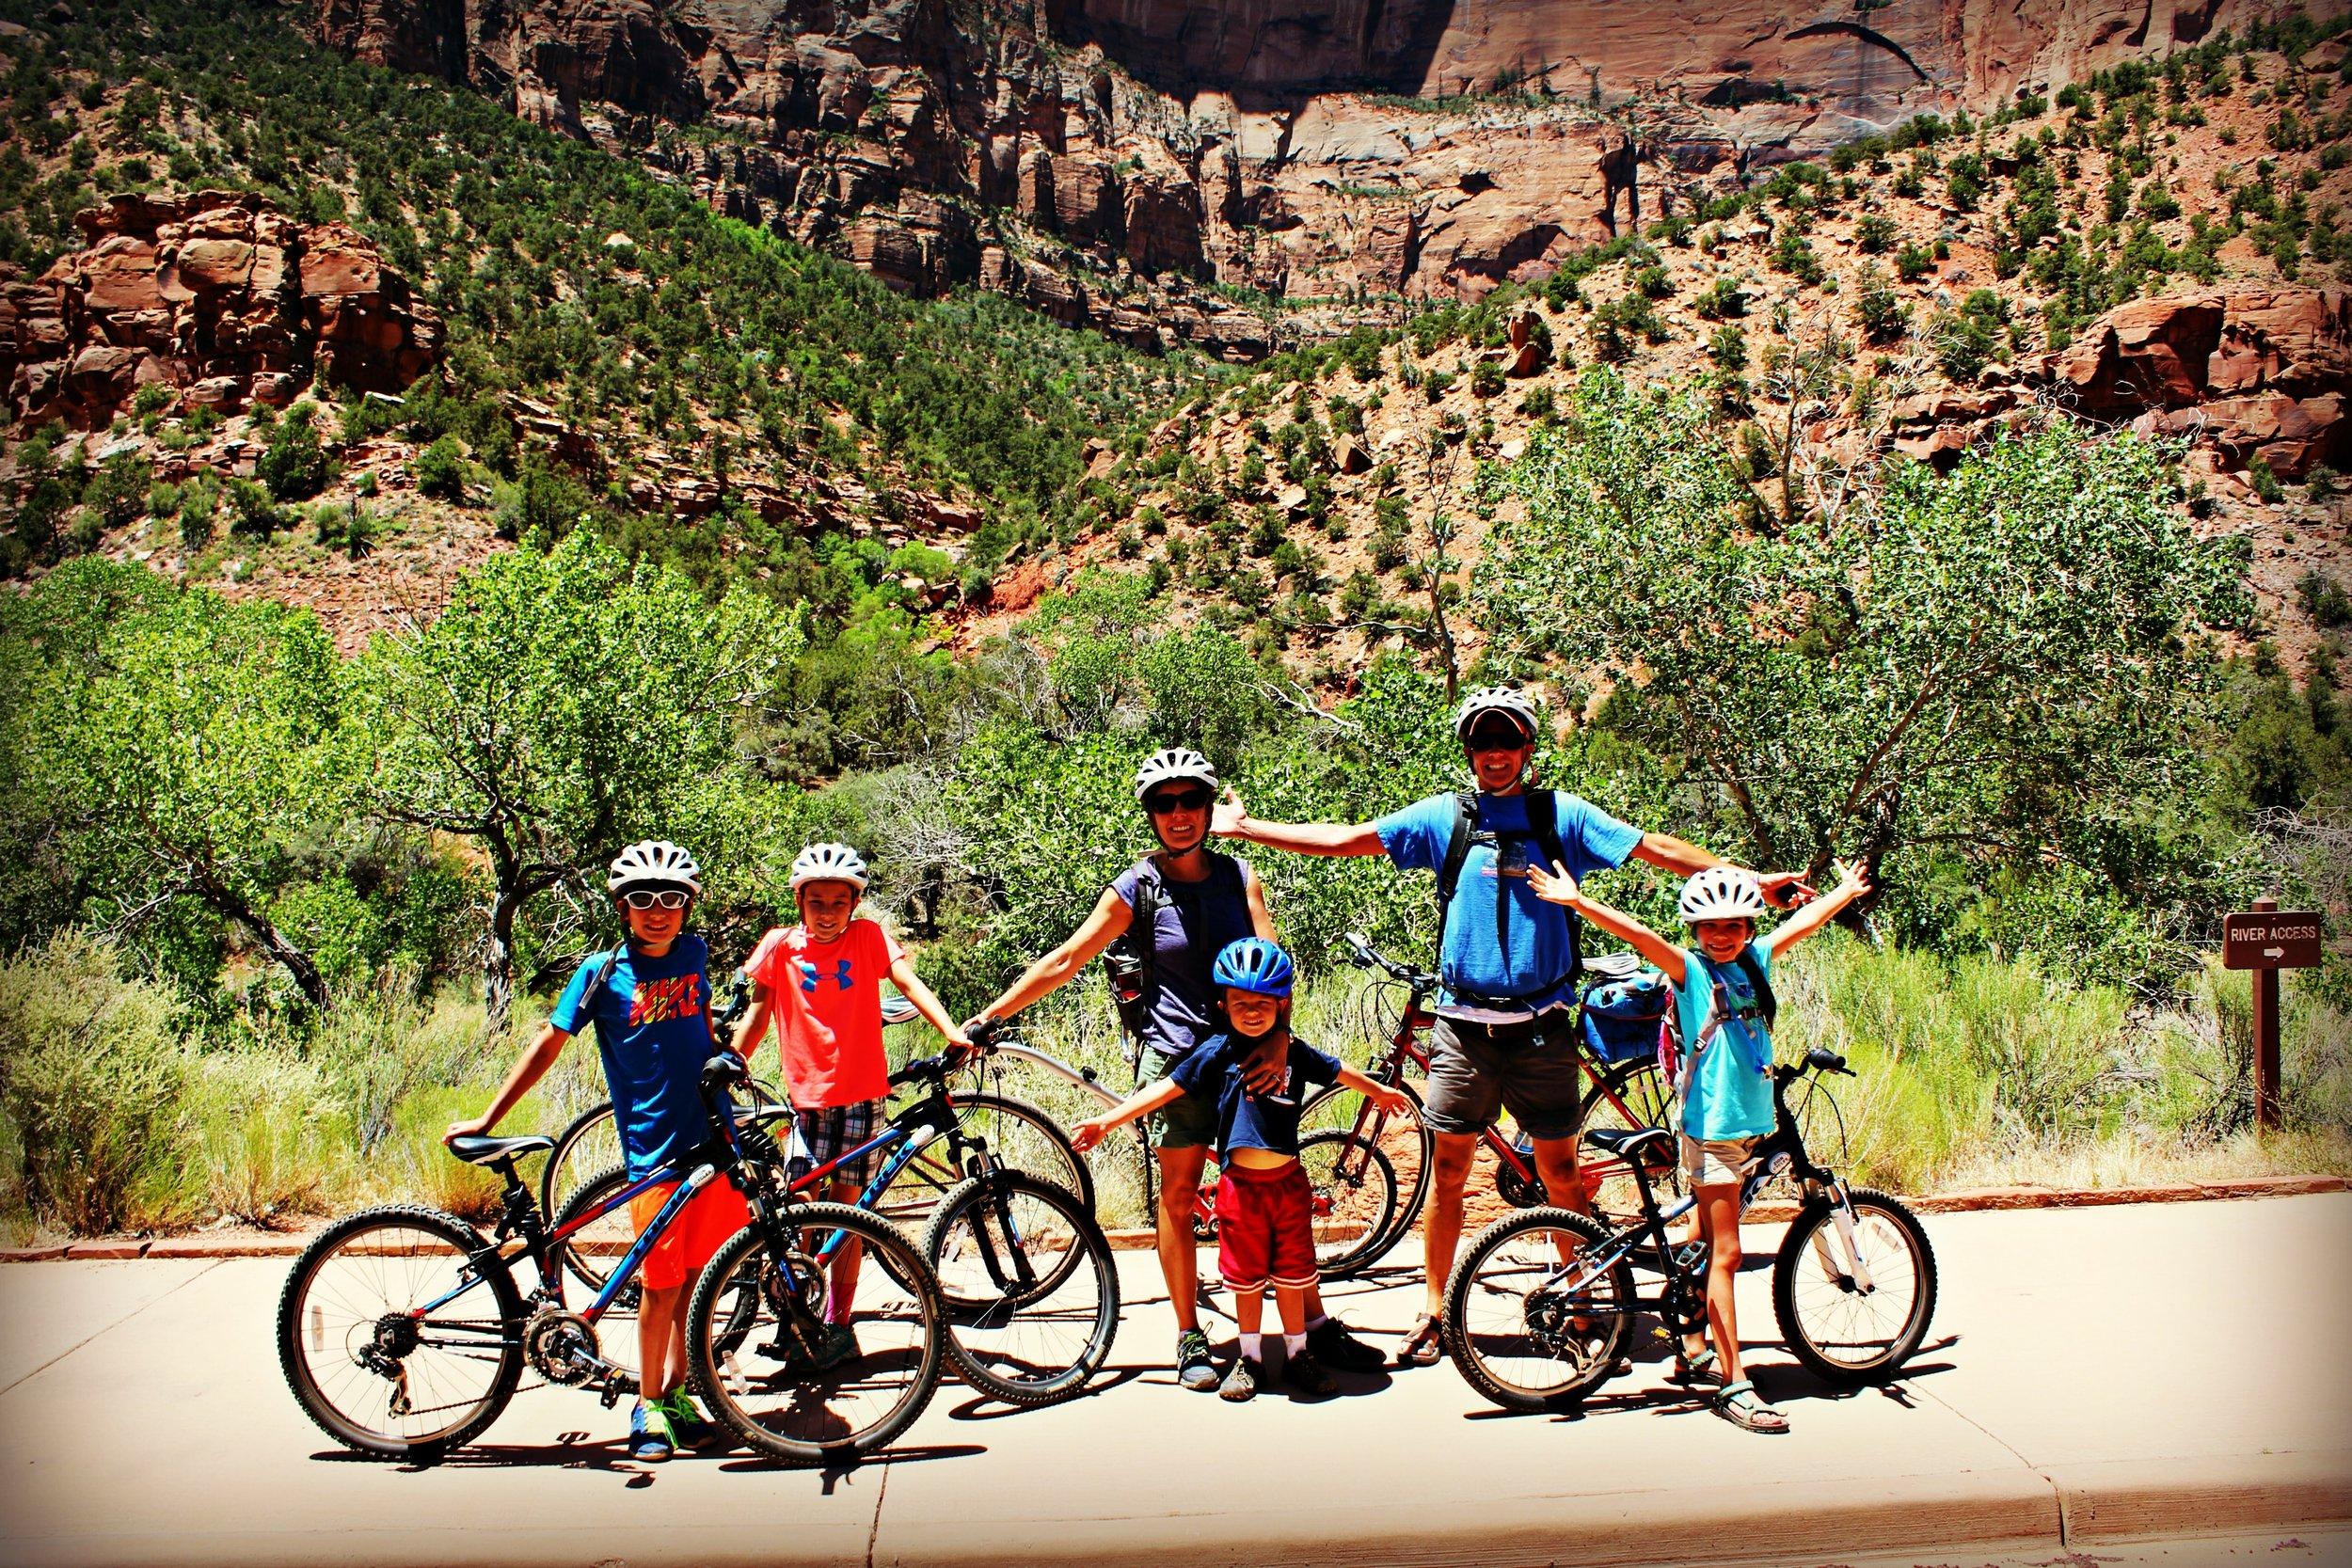 family-biking-zion-national-park